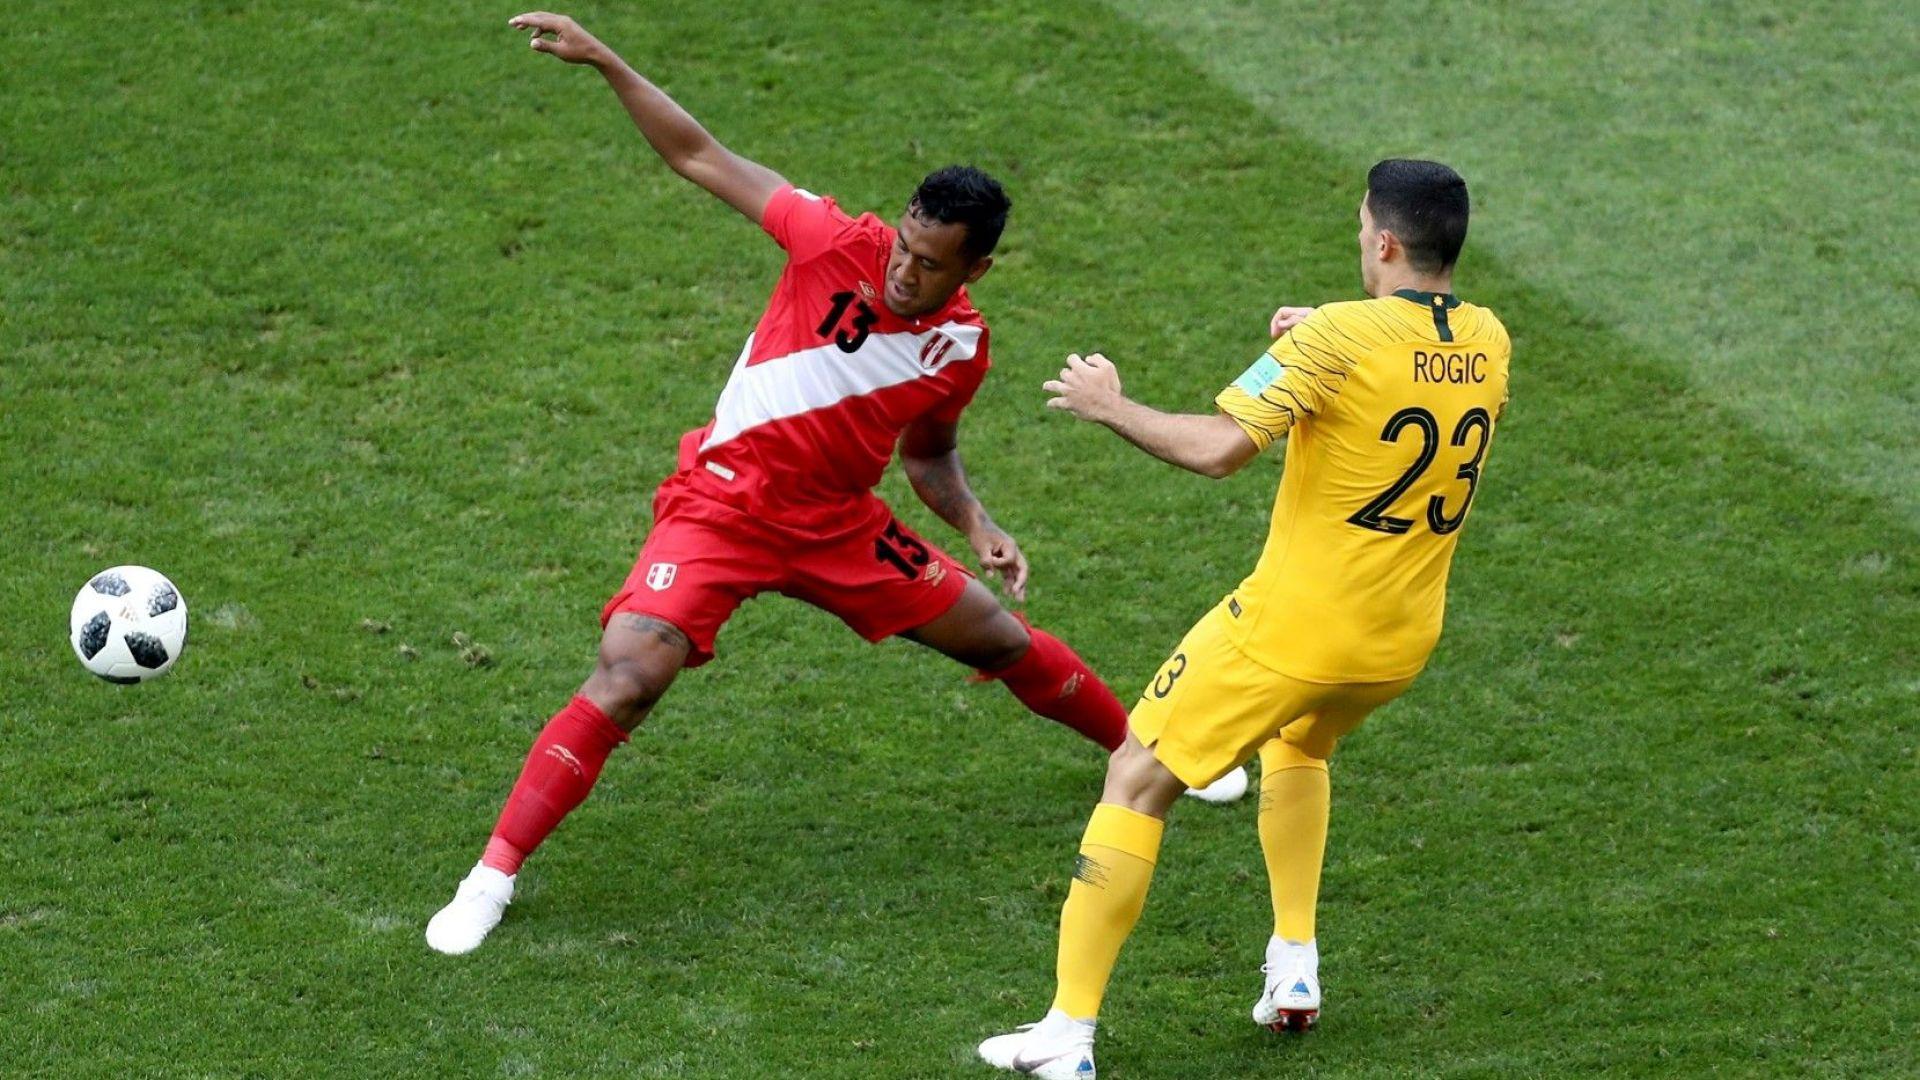 Австралия - Перу 0:2 (статистика)